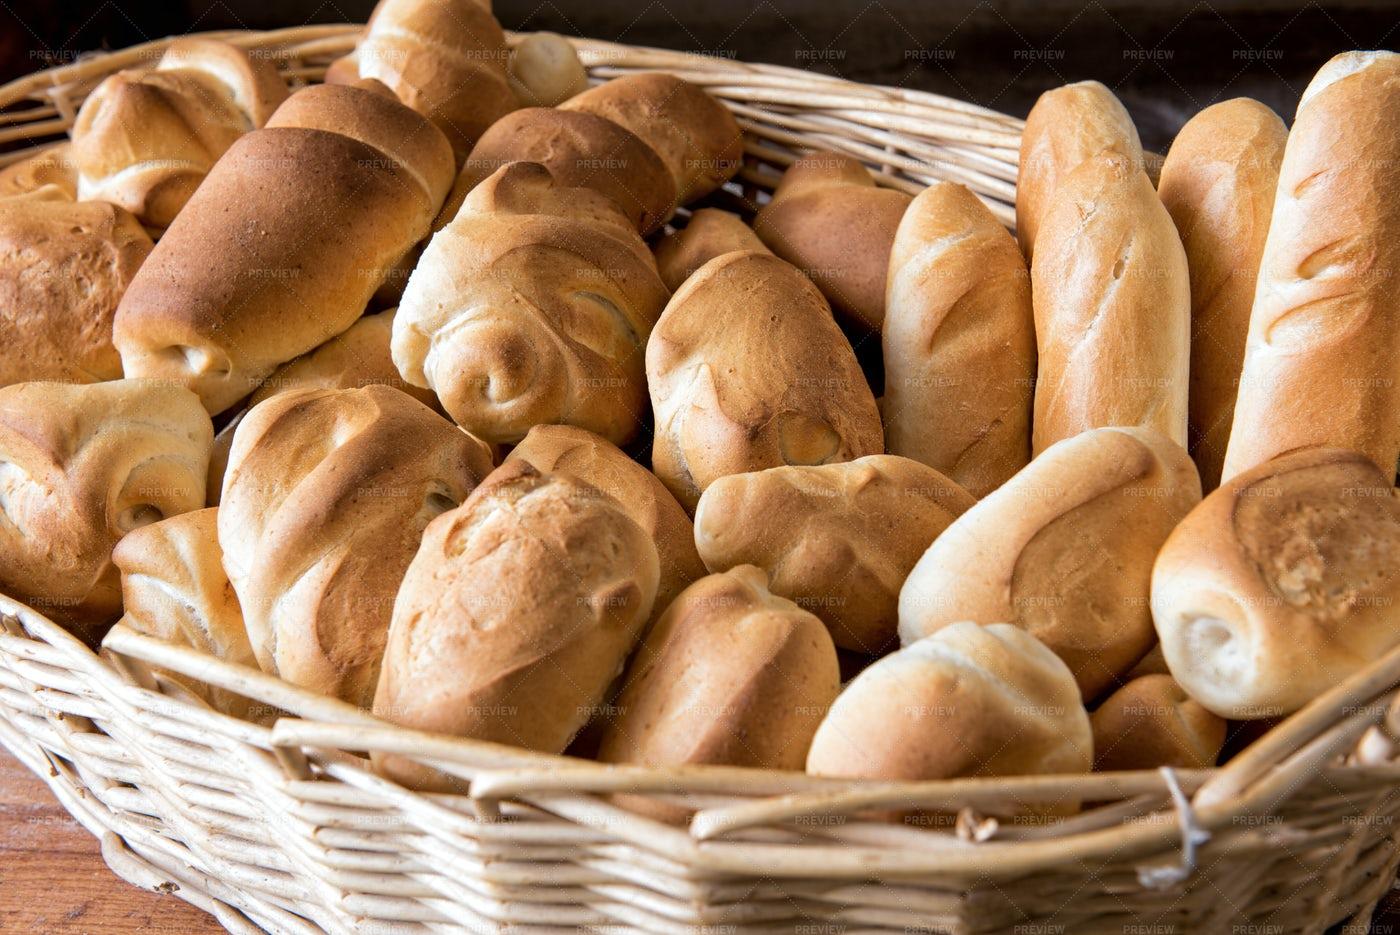 Wicker Basket Of Bread: Stock Photos